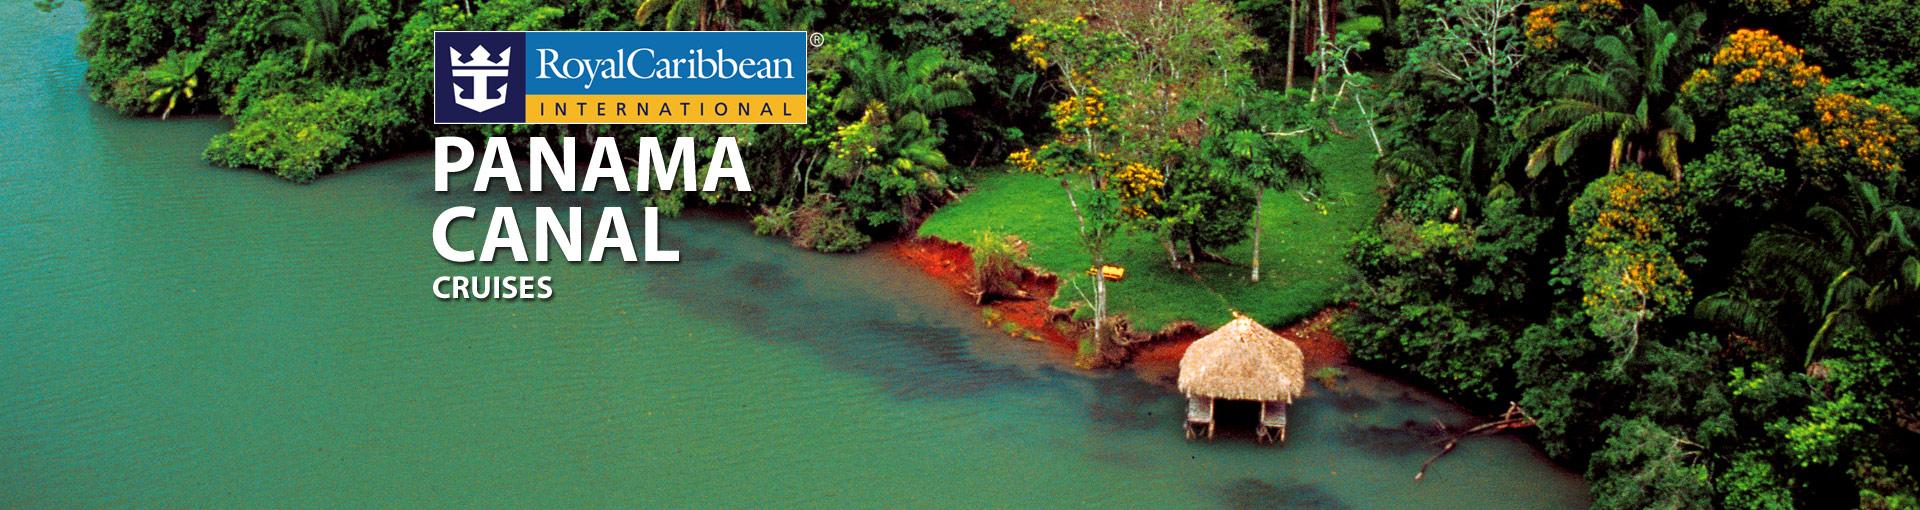 Royal Caribbean Panama Canal Cruises